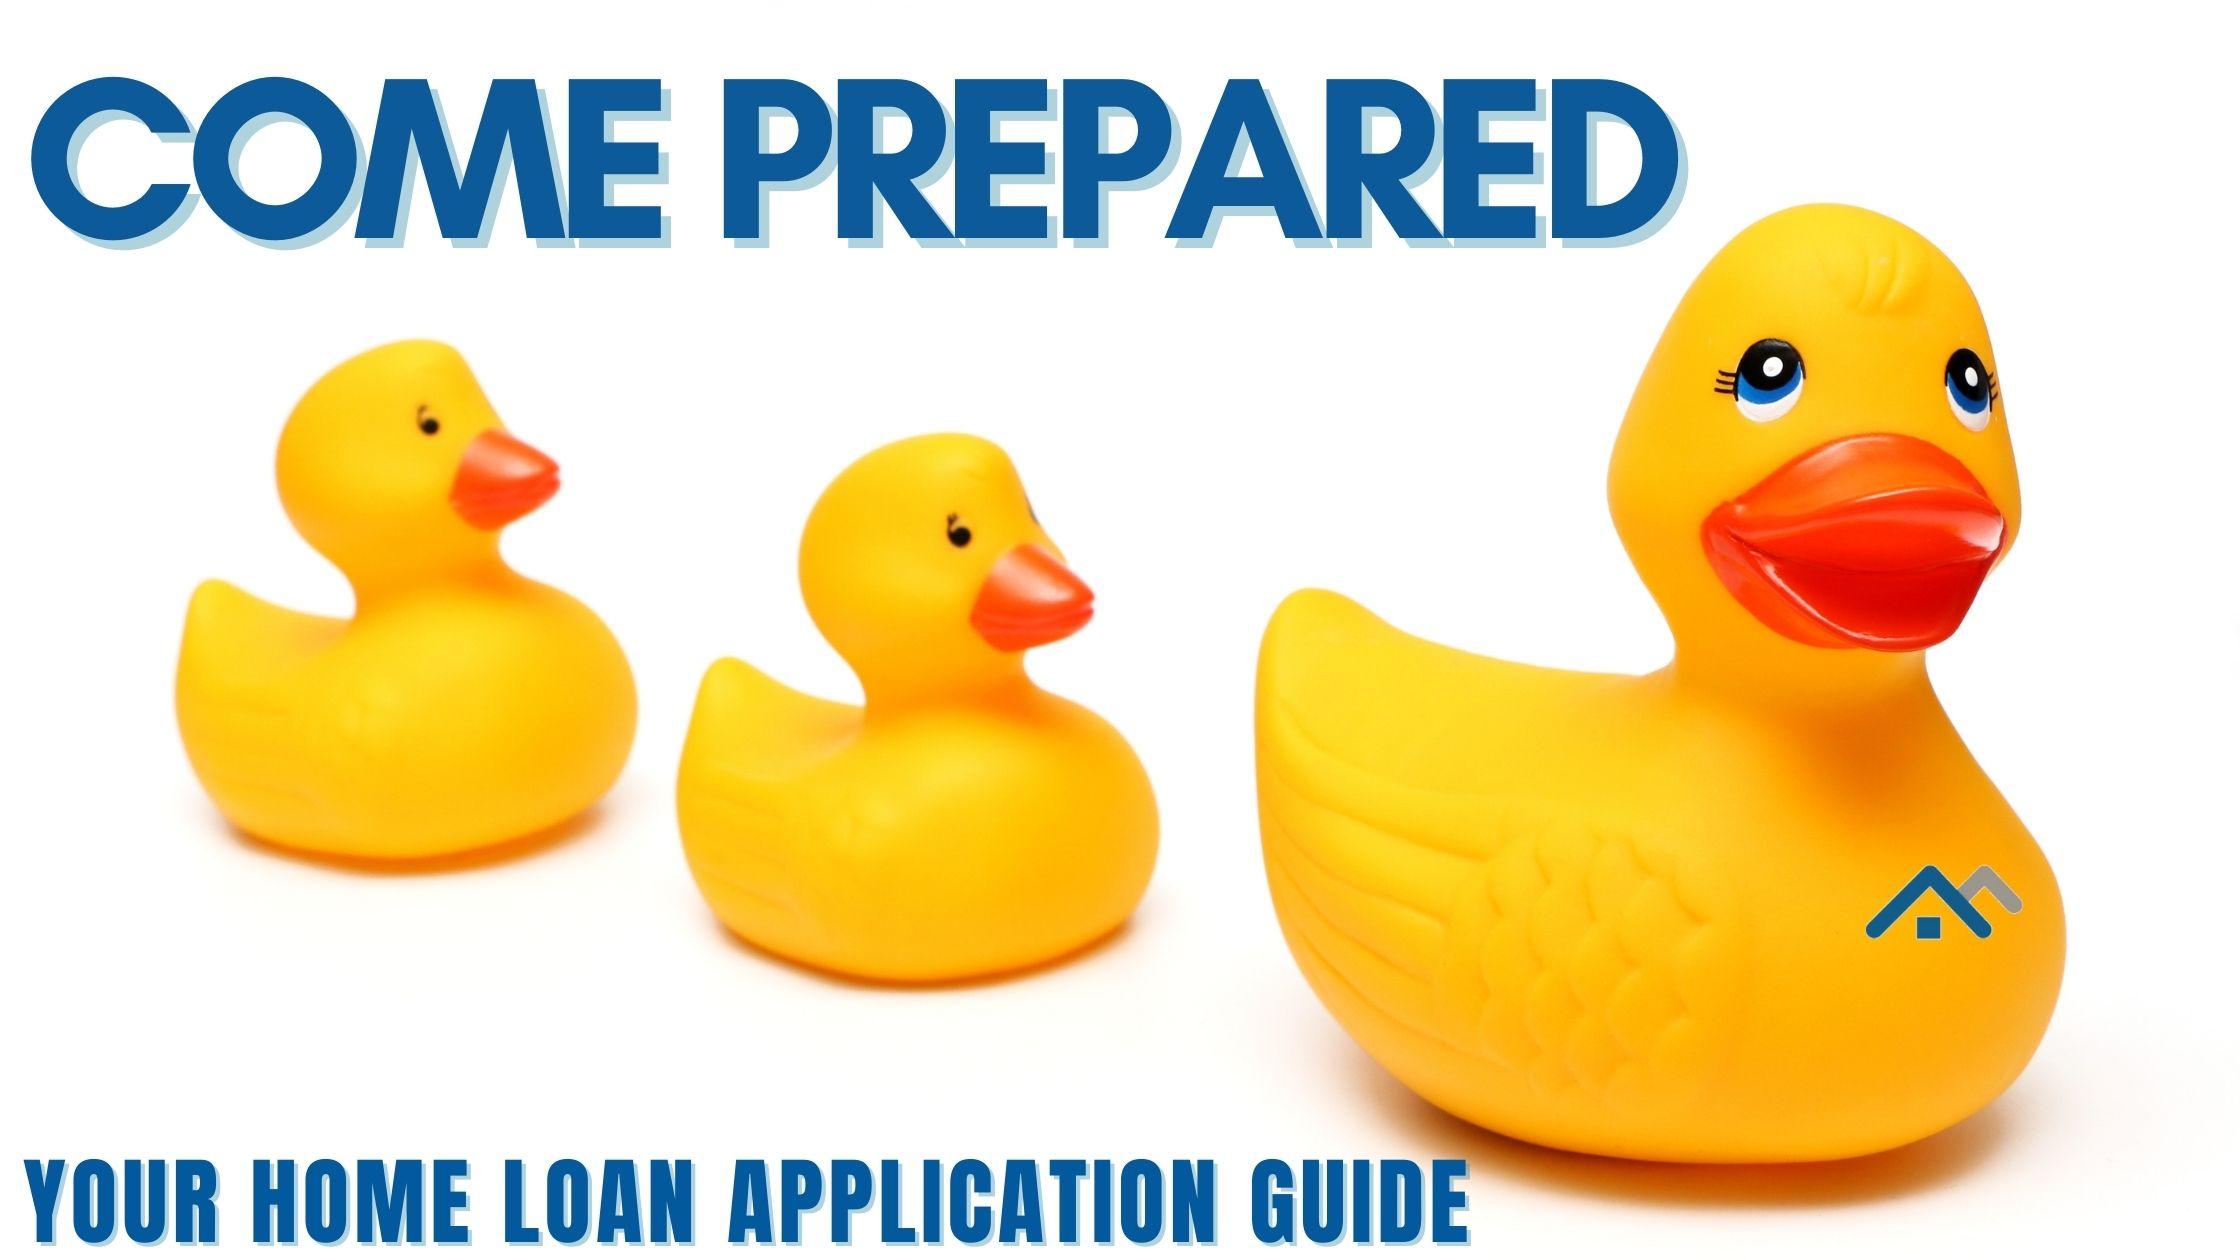 Come prepared: your home loan application guide